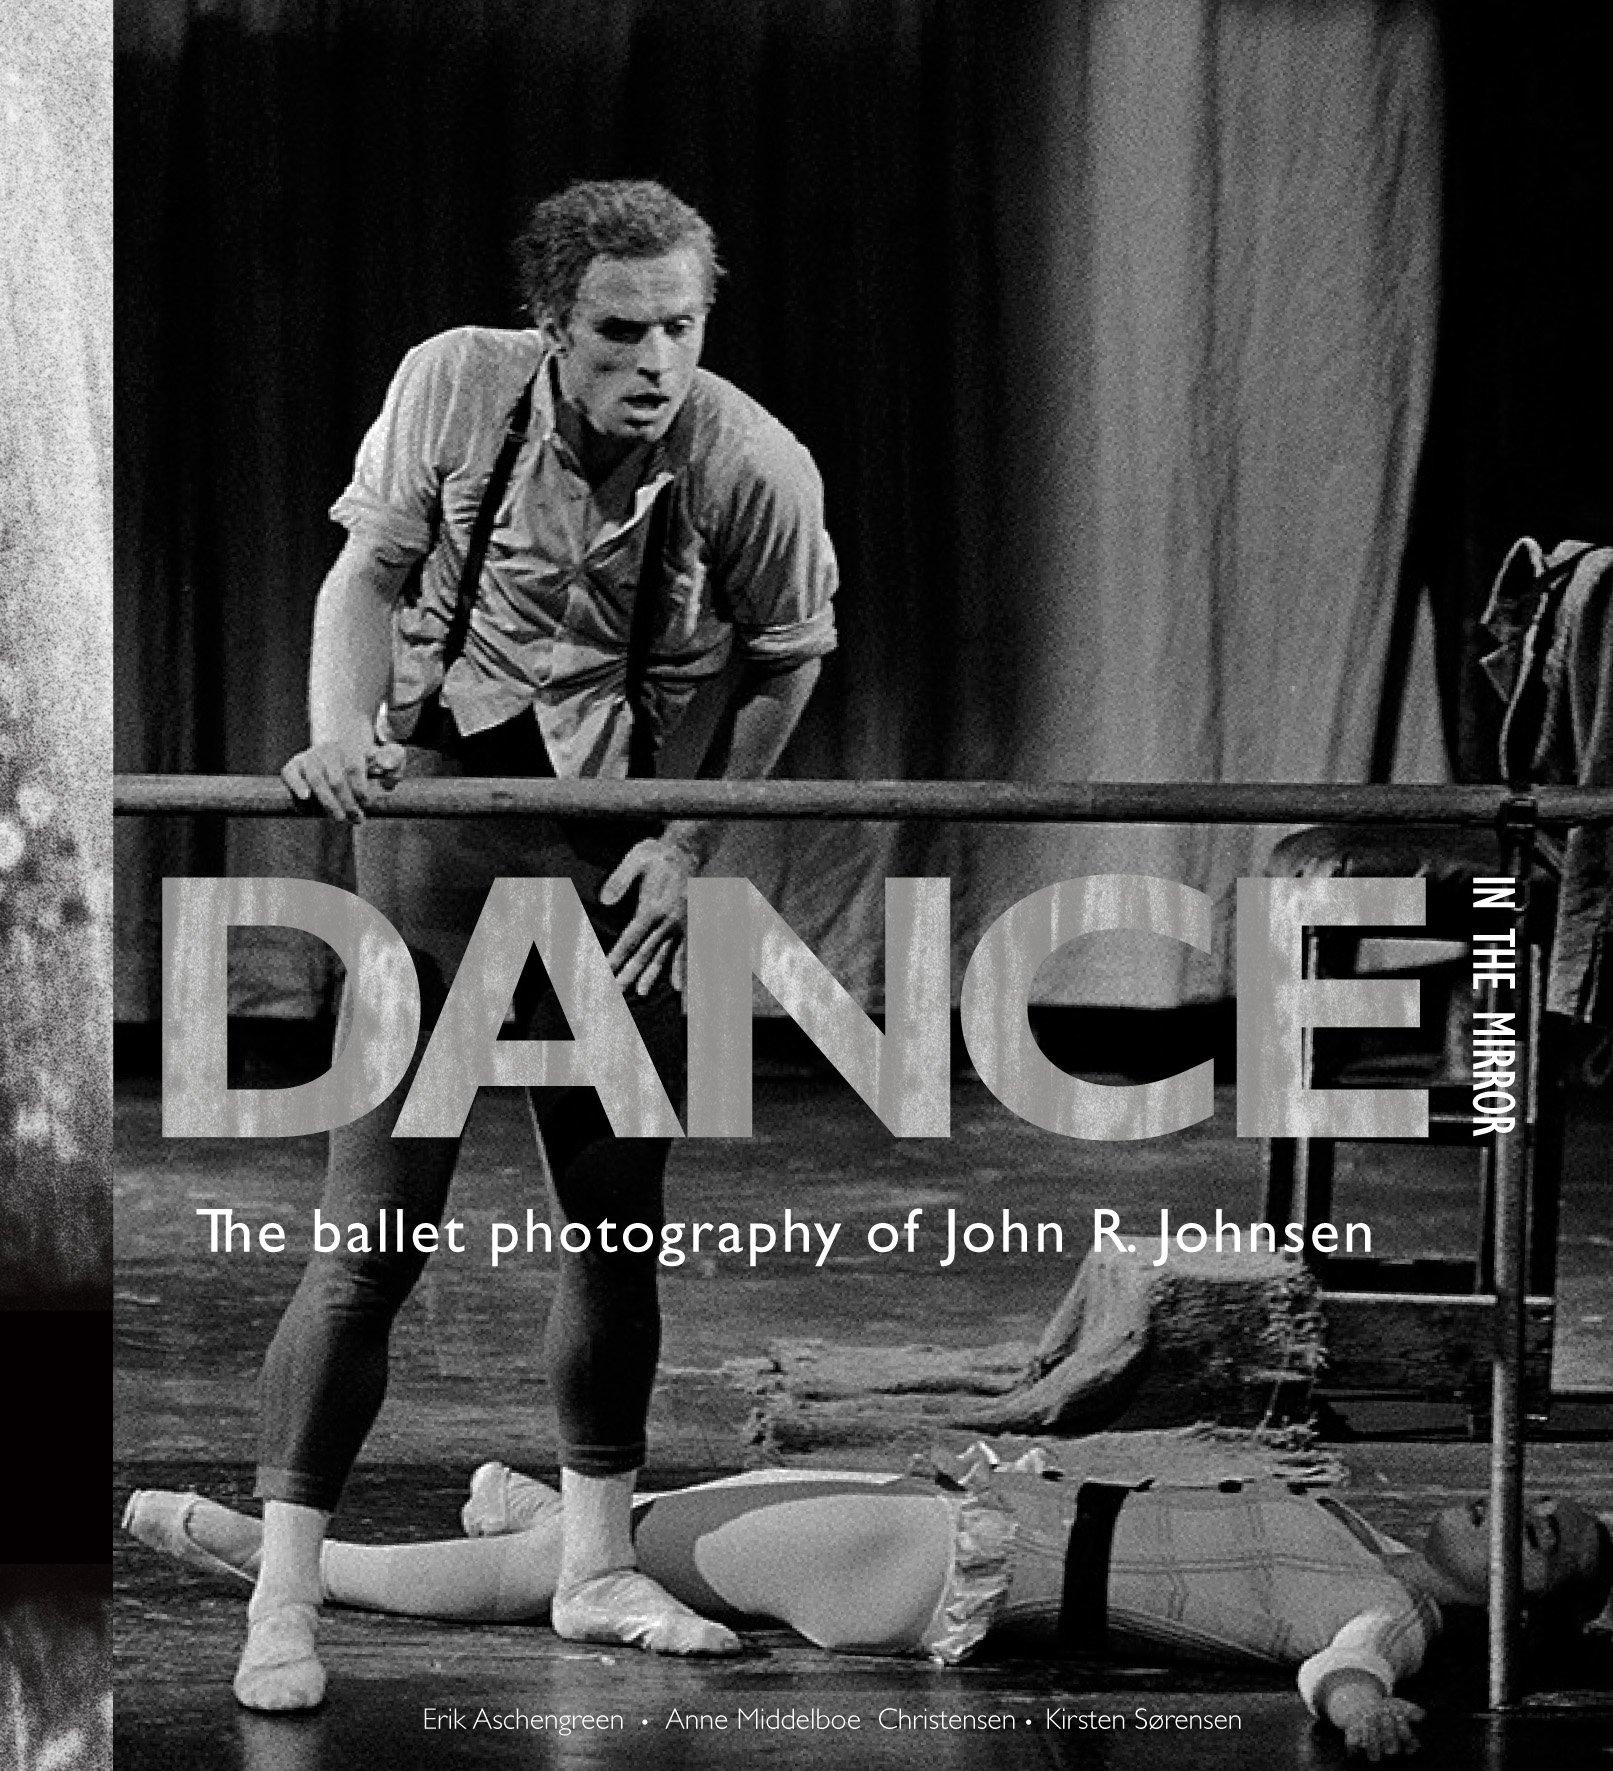 Dance in the Mirror: The ballet photography of John R. Johnsen